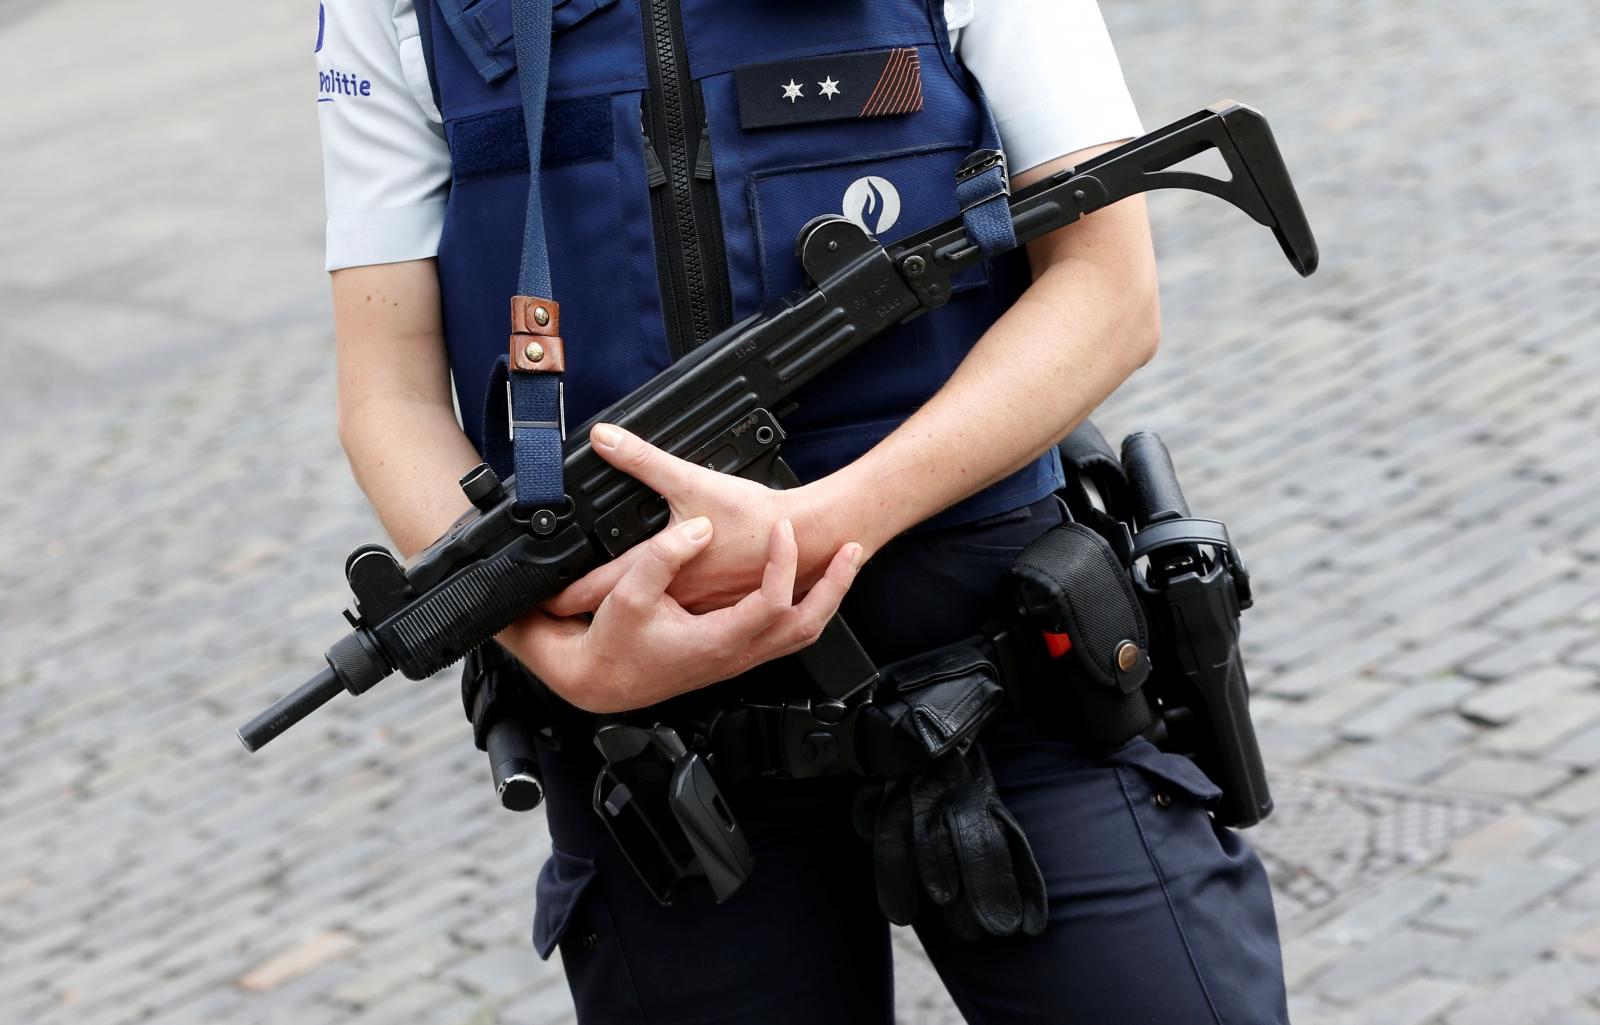 Belgian police